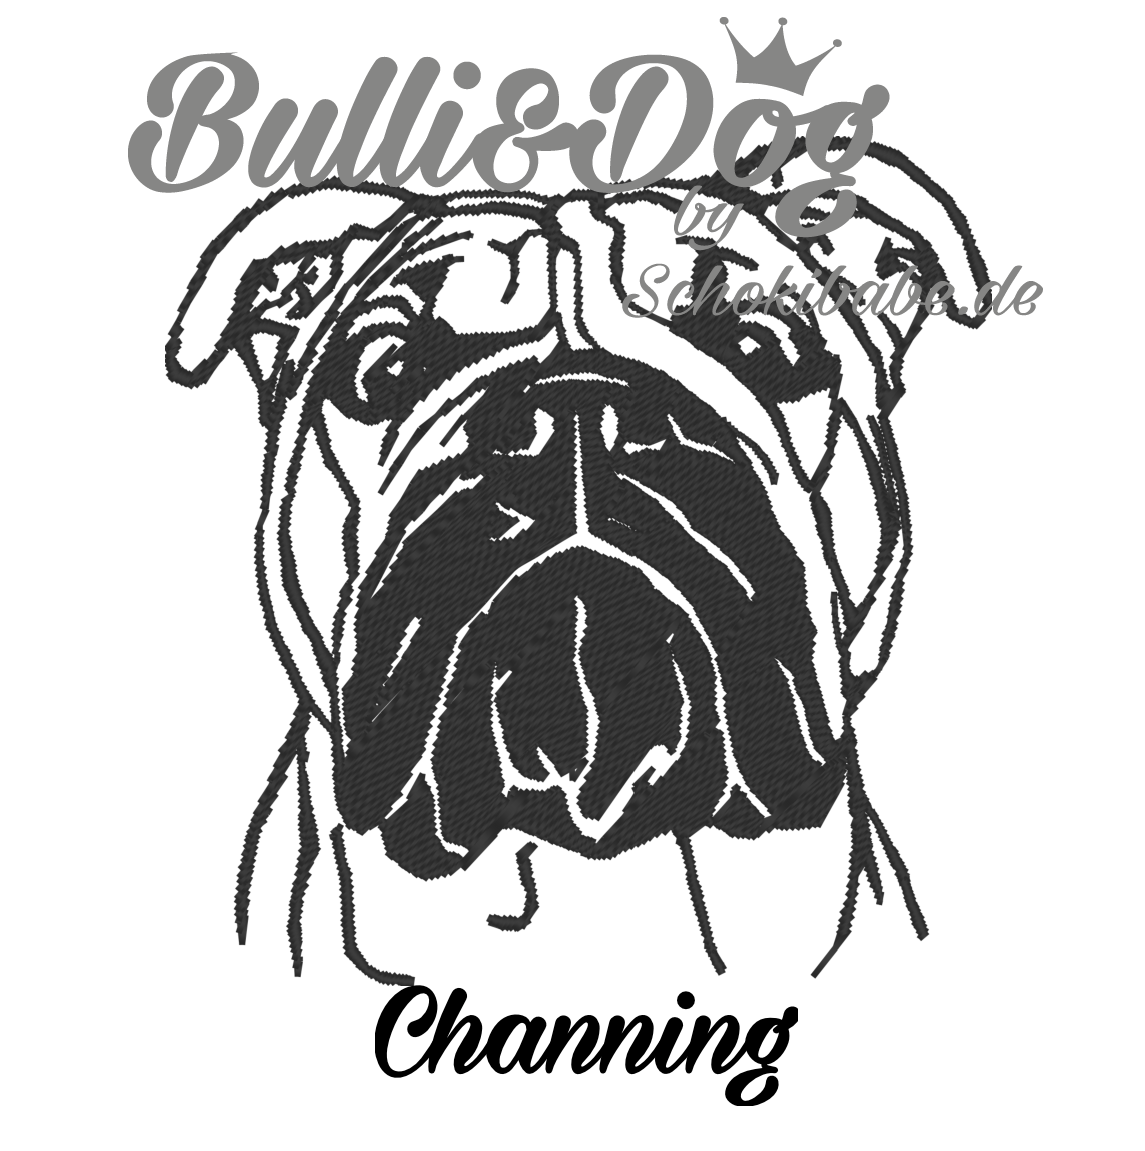 Channing_7x7-Kopie5b5c228cbf51b